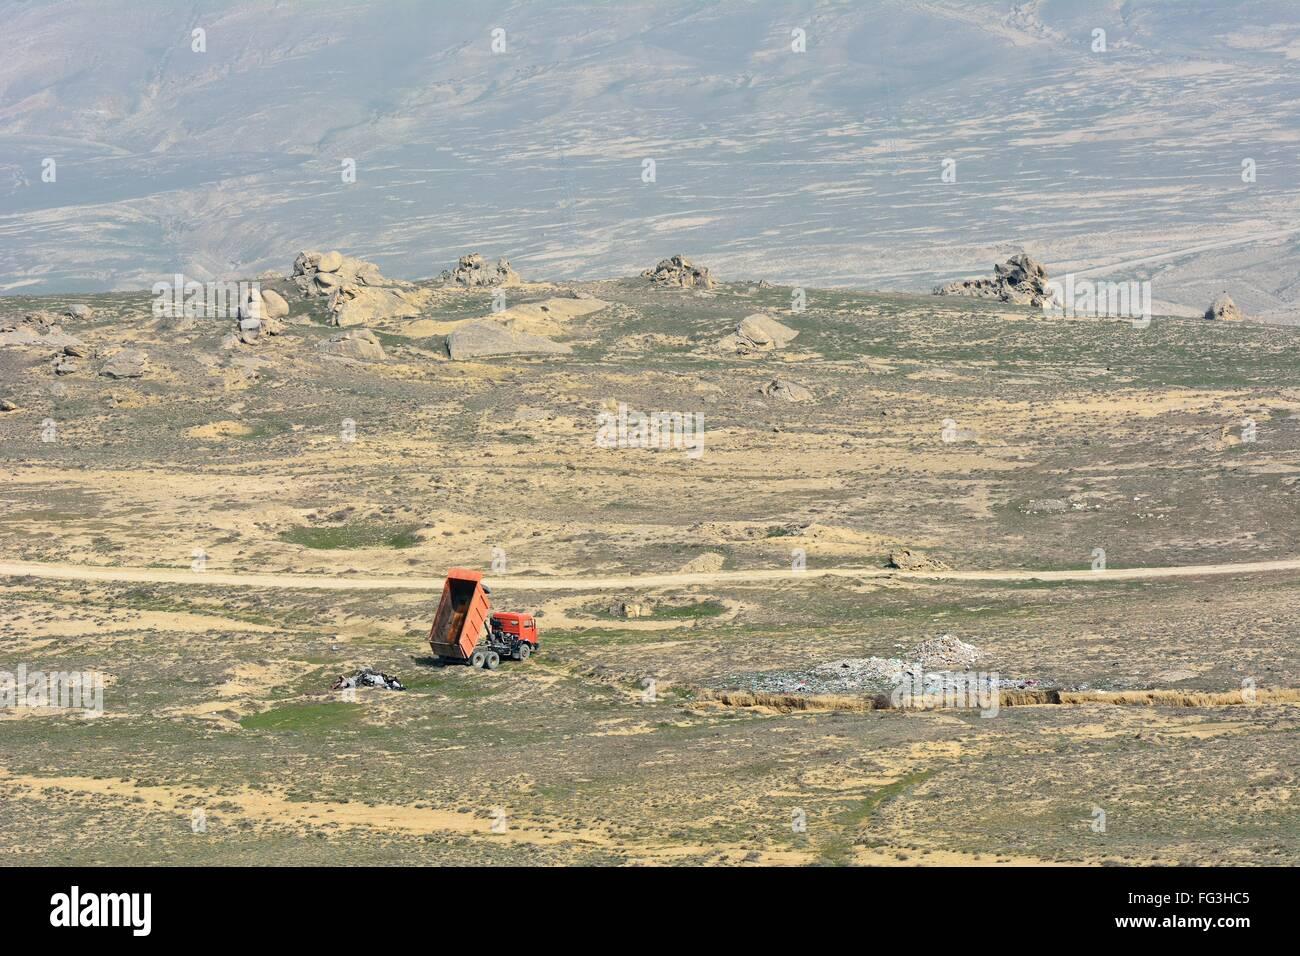 Truck dumping rubbish in Azerbaijani countryside. Trash is improperly dumped in open countryside in Lokbatan, near - Stock Image